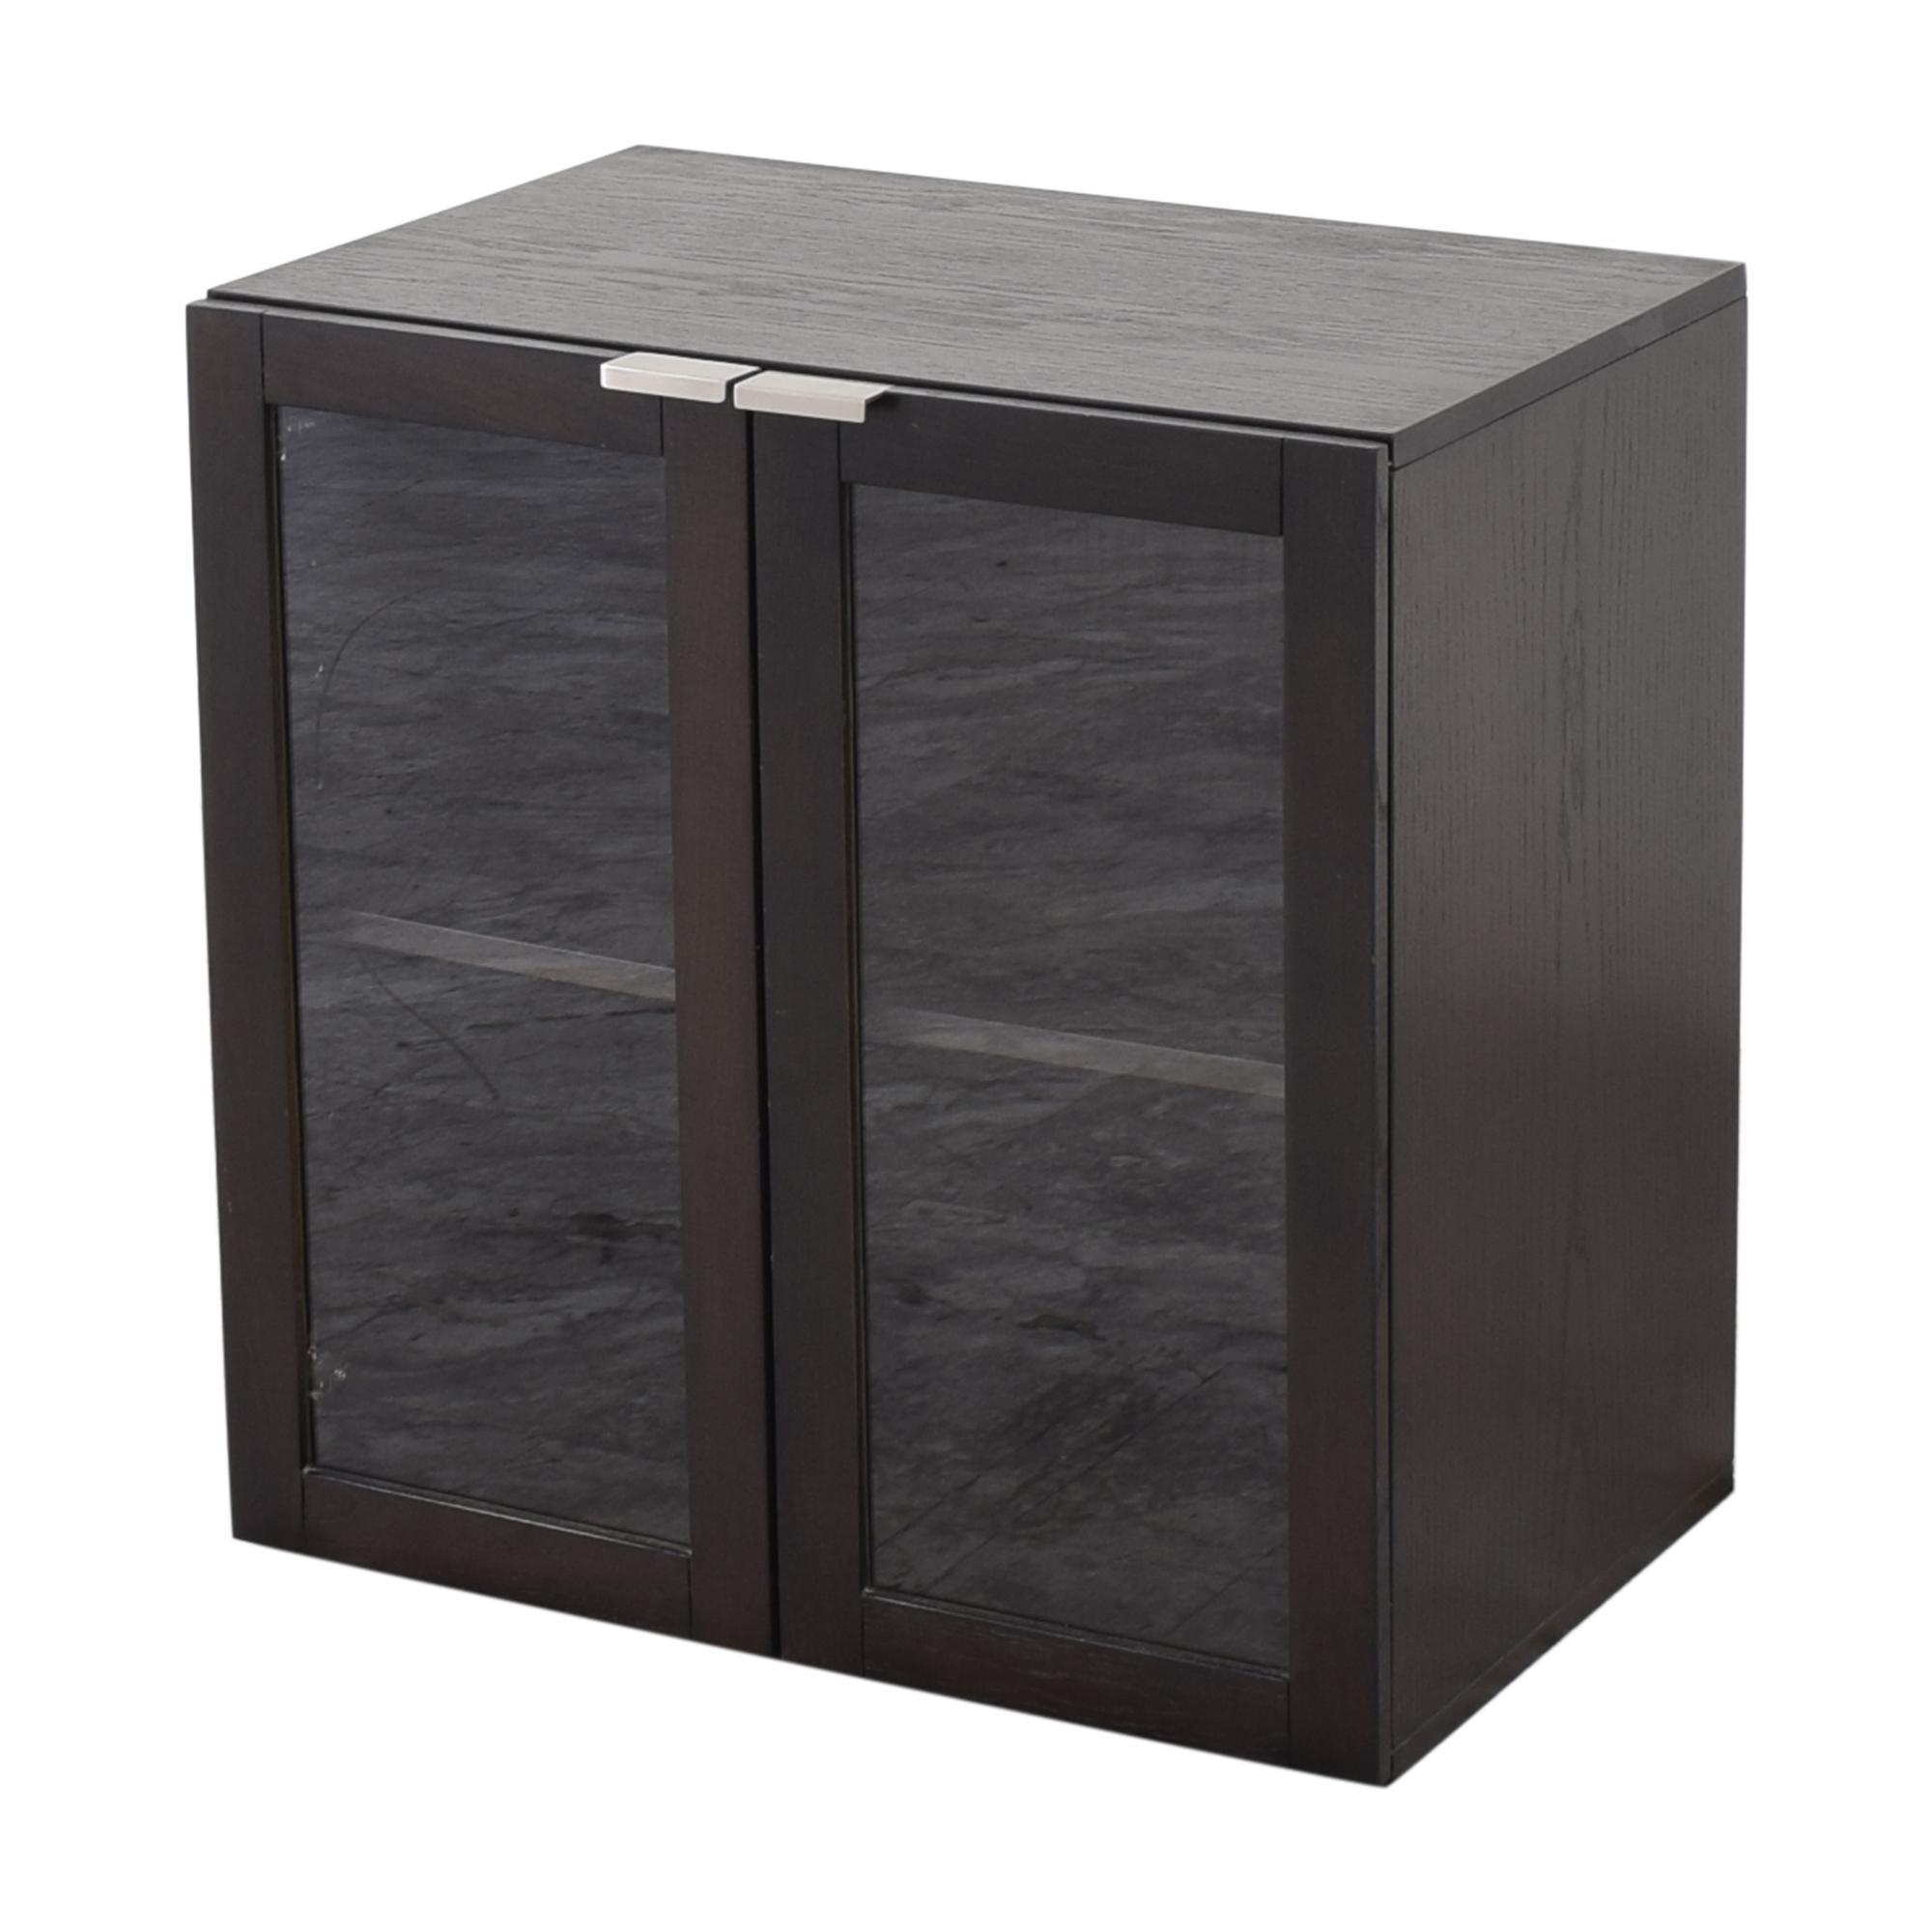 West Elm West Elm Everywhere Storage Two Door Cabinet